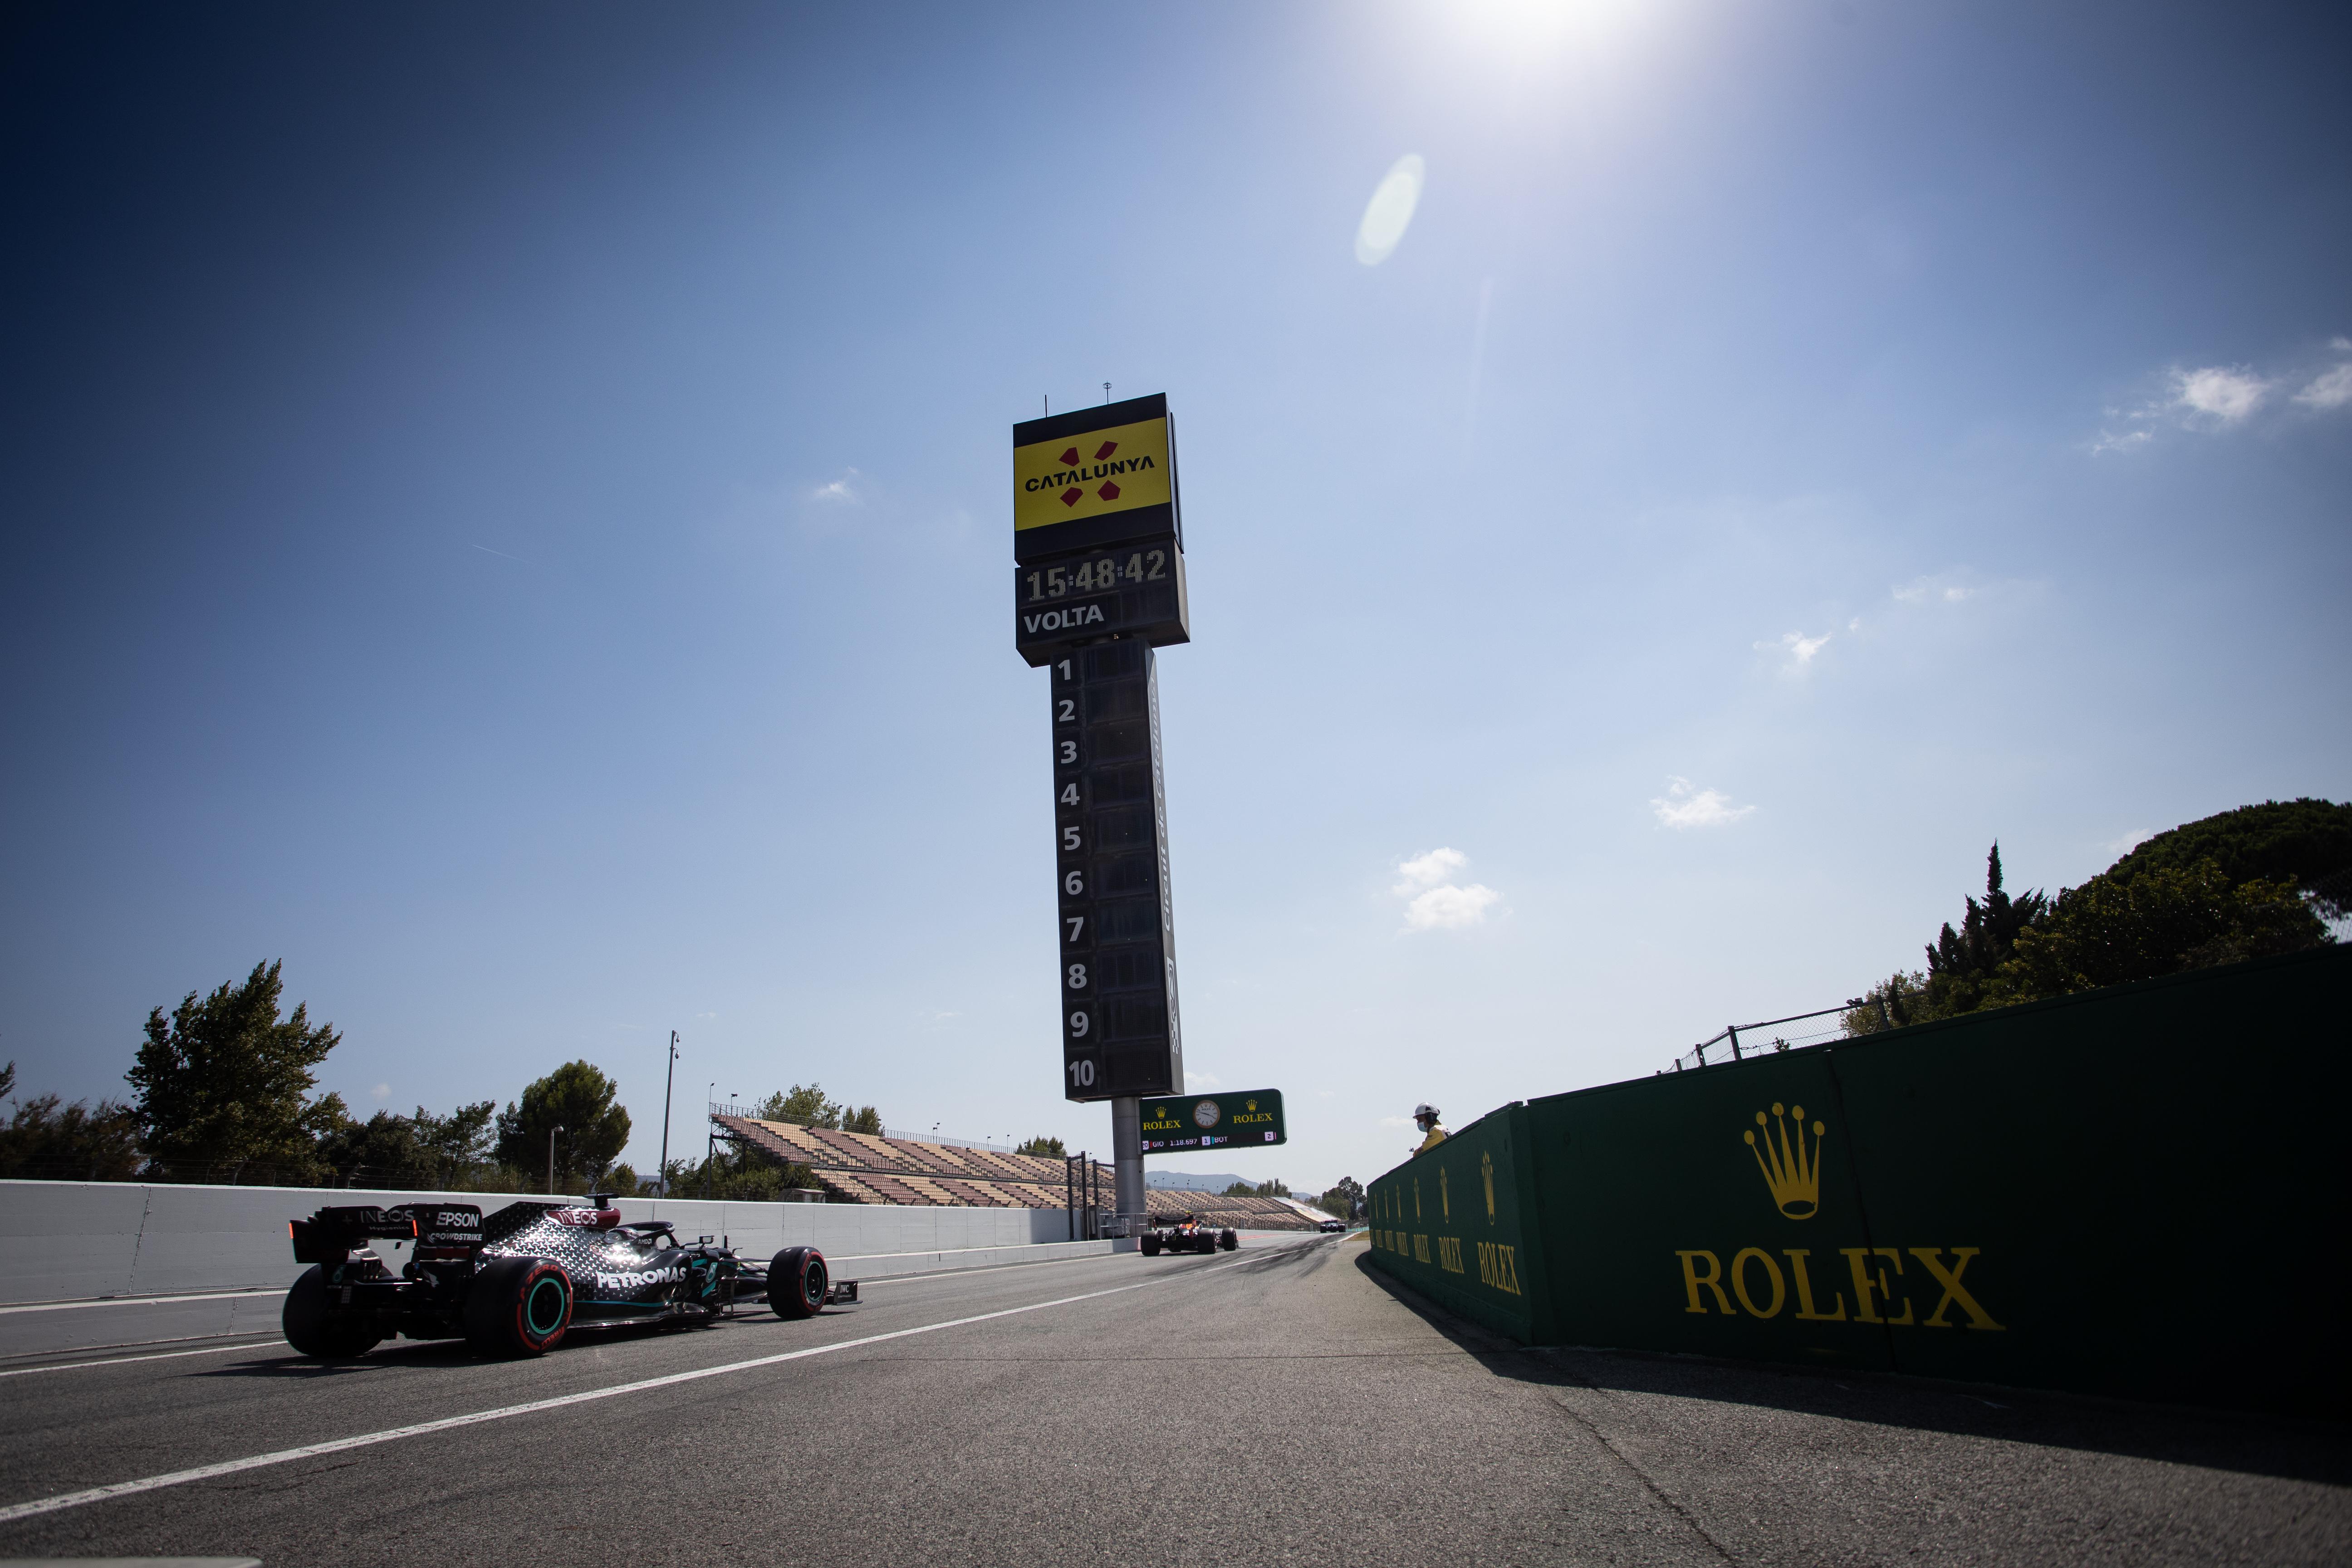 Motor Racing Formula One World Championship Spanish Grand Prix Qualifying Day Barcelona, Spain